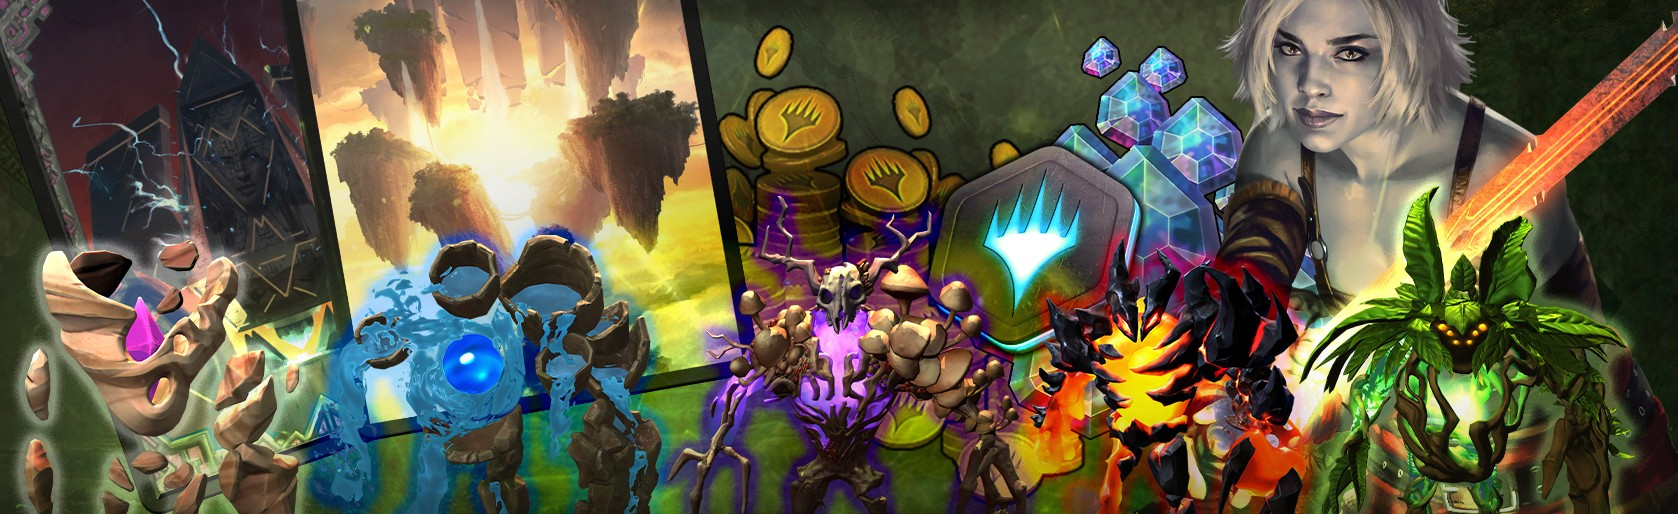 Wizards of the Coast needs to revamp Magic: Arena's battle pass philosophy screenshot